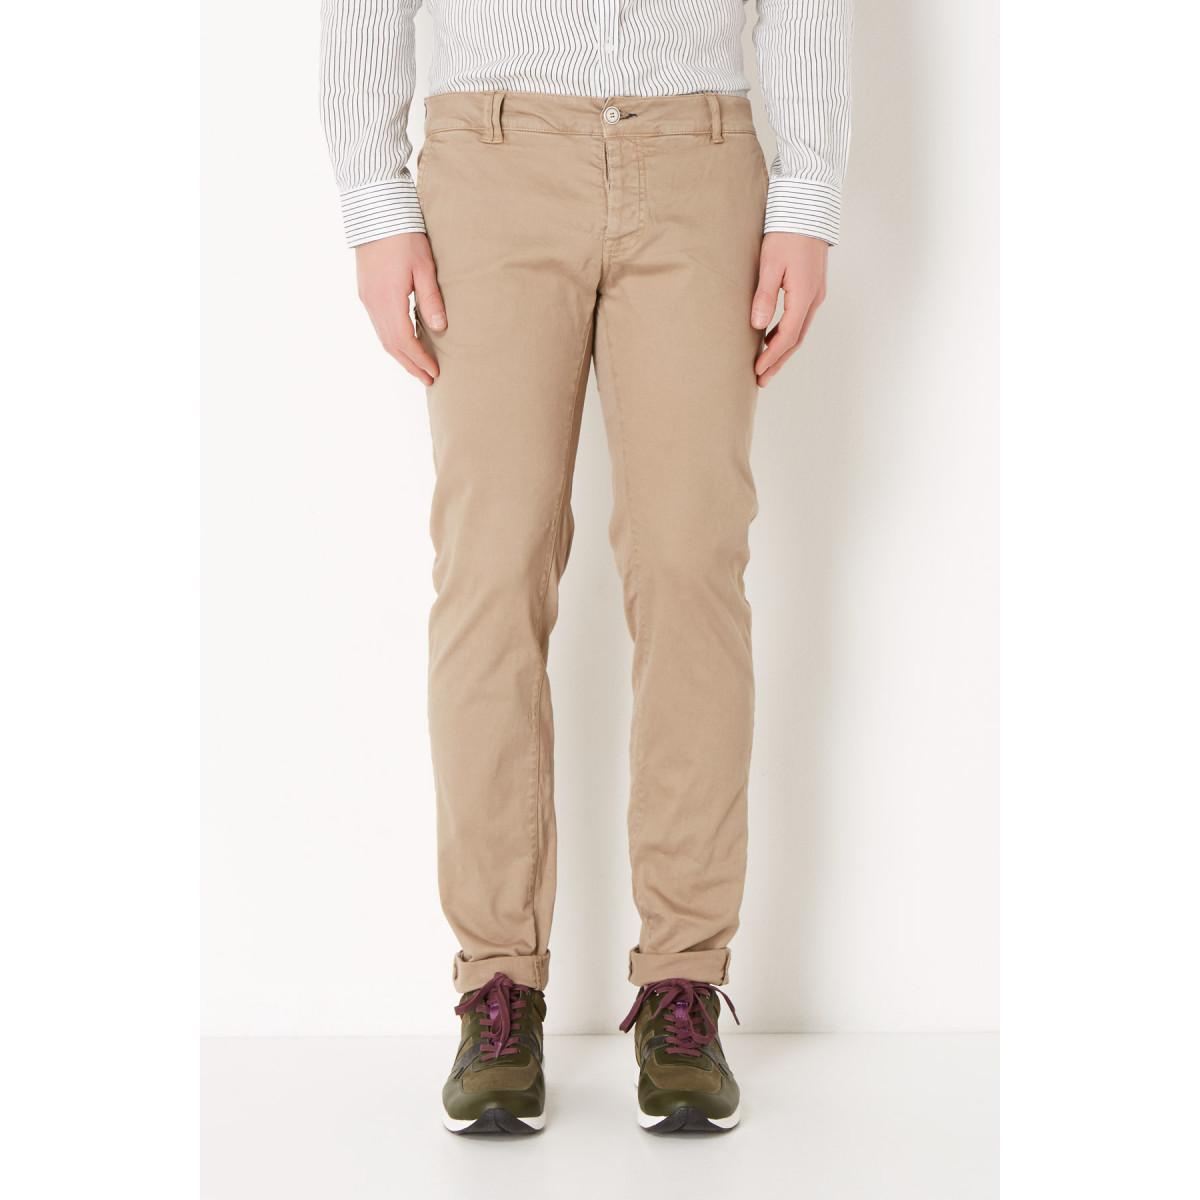 9691972cc97b GAUDI JEANS - Pantalone modello chino - MAN - Gruppo CAT Shop Online